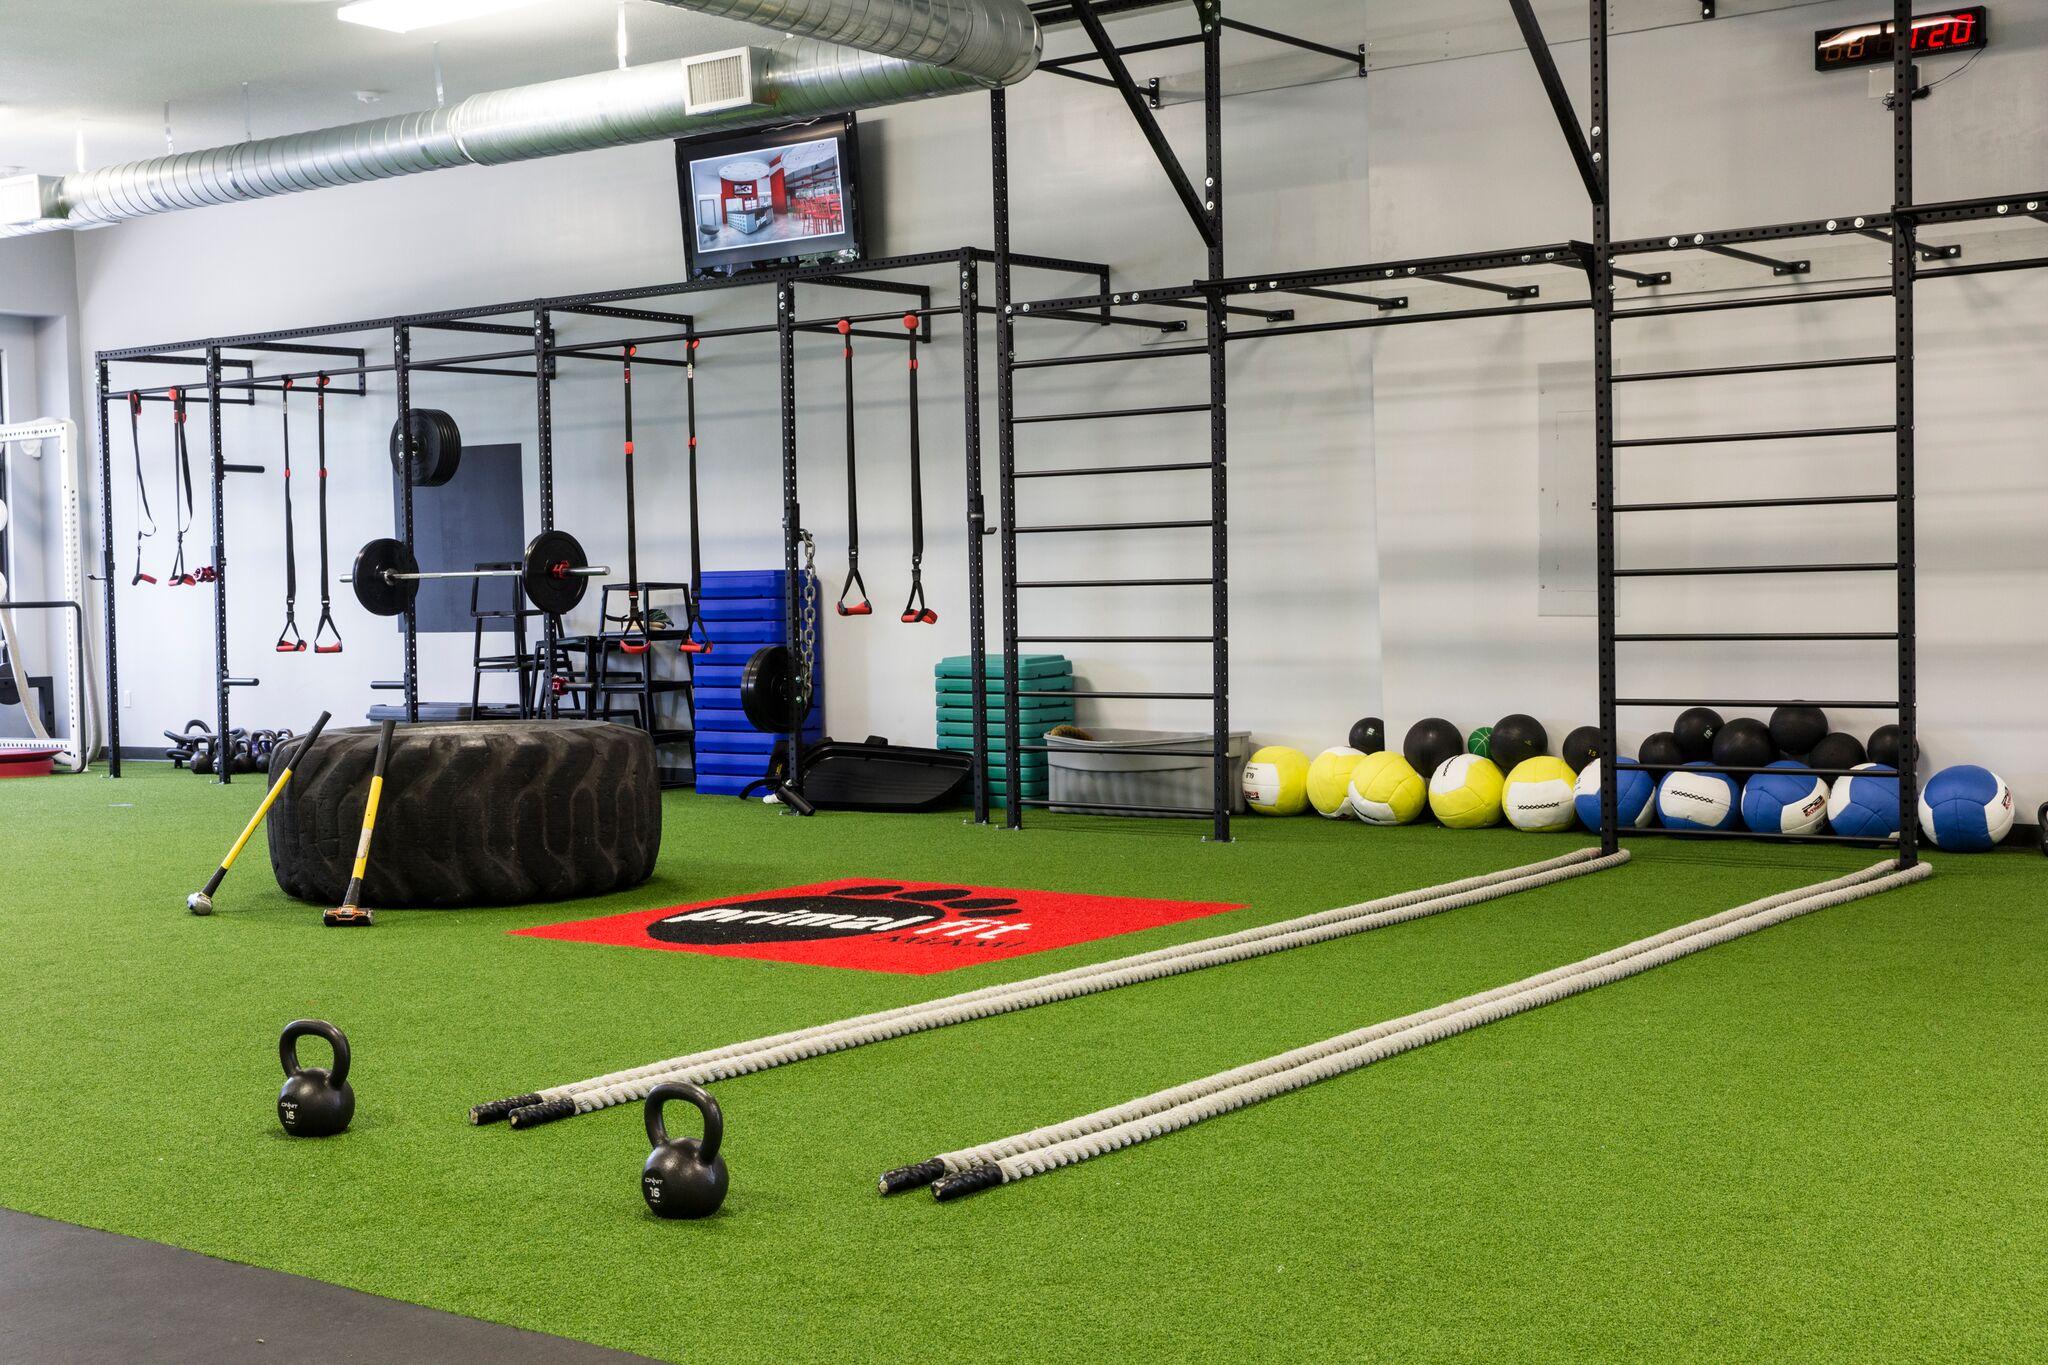 Primal Fit 360|Primal Fit Miami: Personal Training + the Pro Athlete Treatment|Primal Fit Miami: Personal Training + the Pro Athlete Treatment|